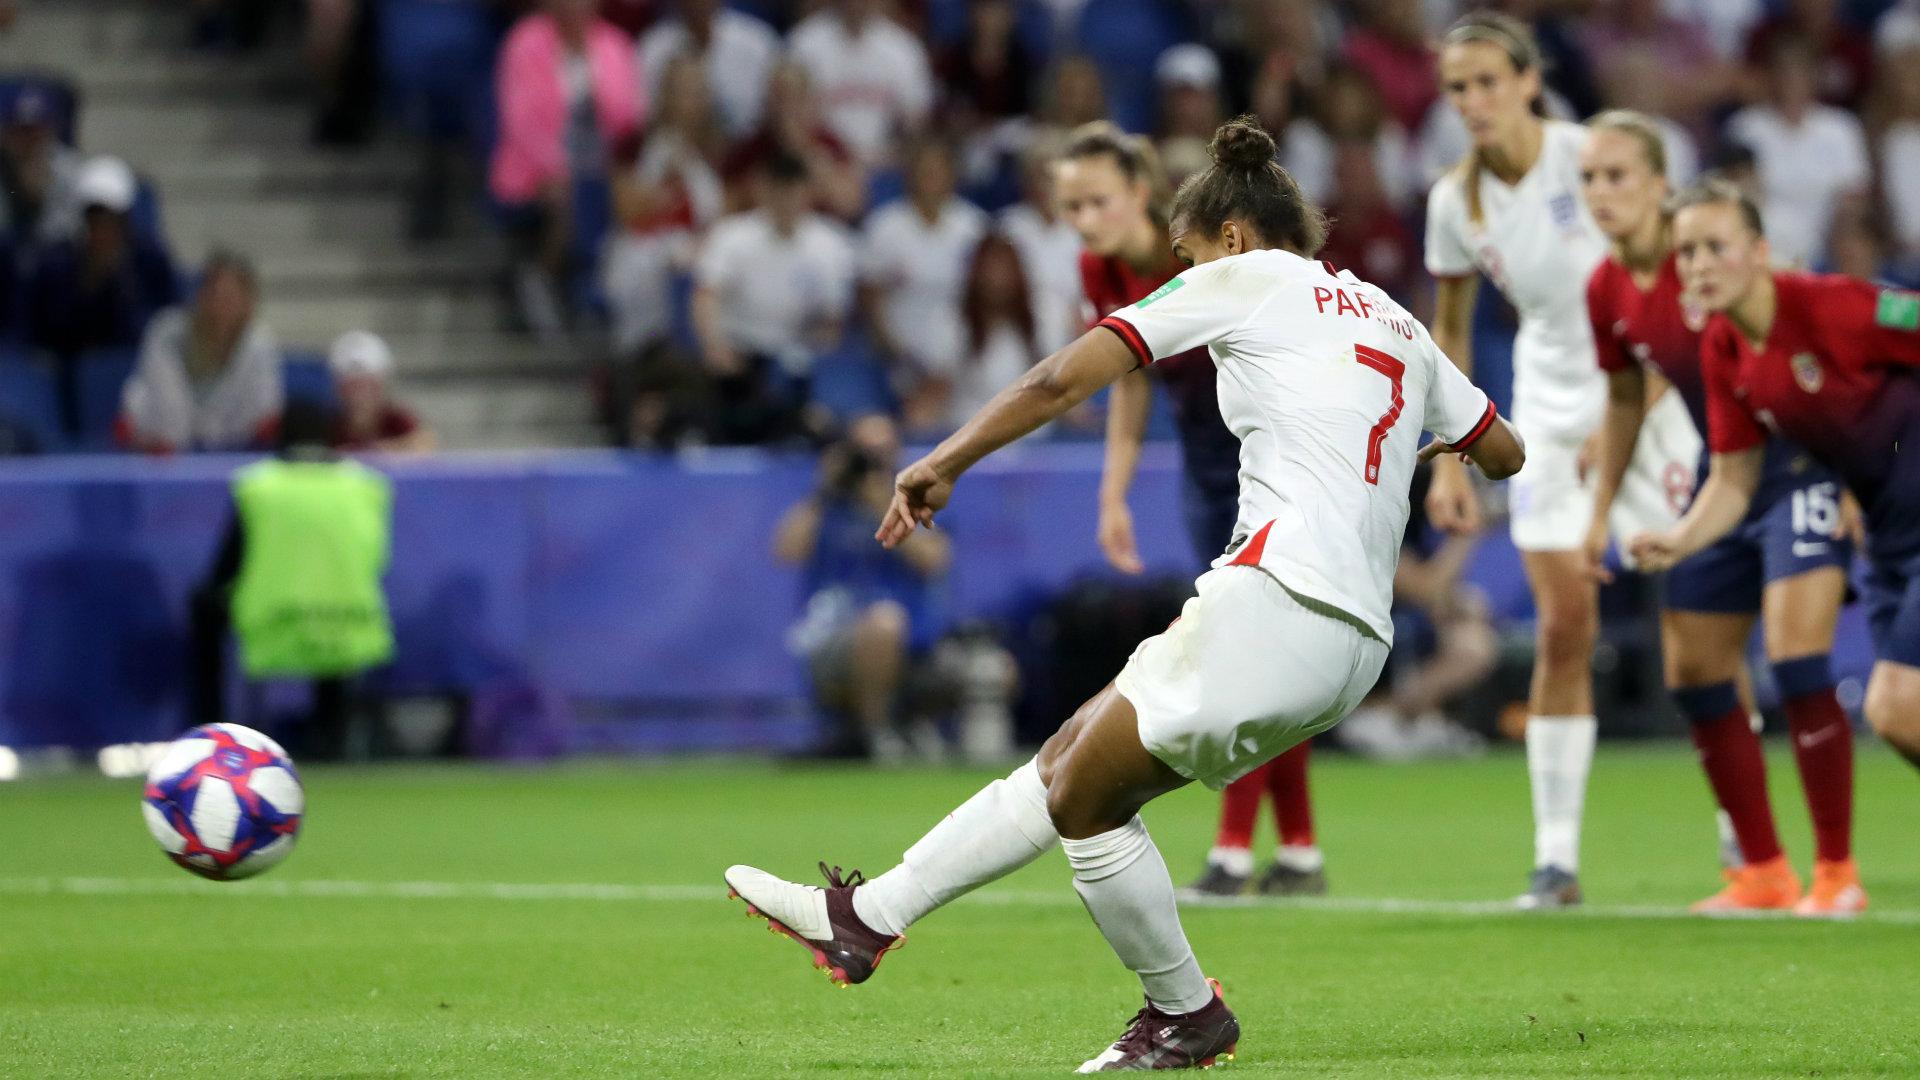 Nikita Parris England vs Norway Women's World Cup 2019